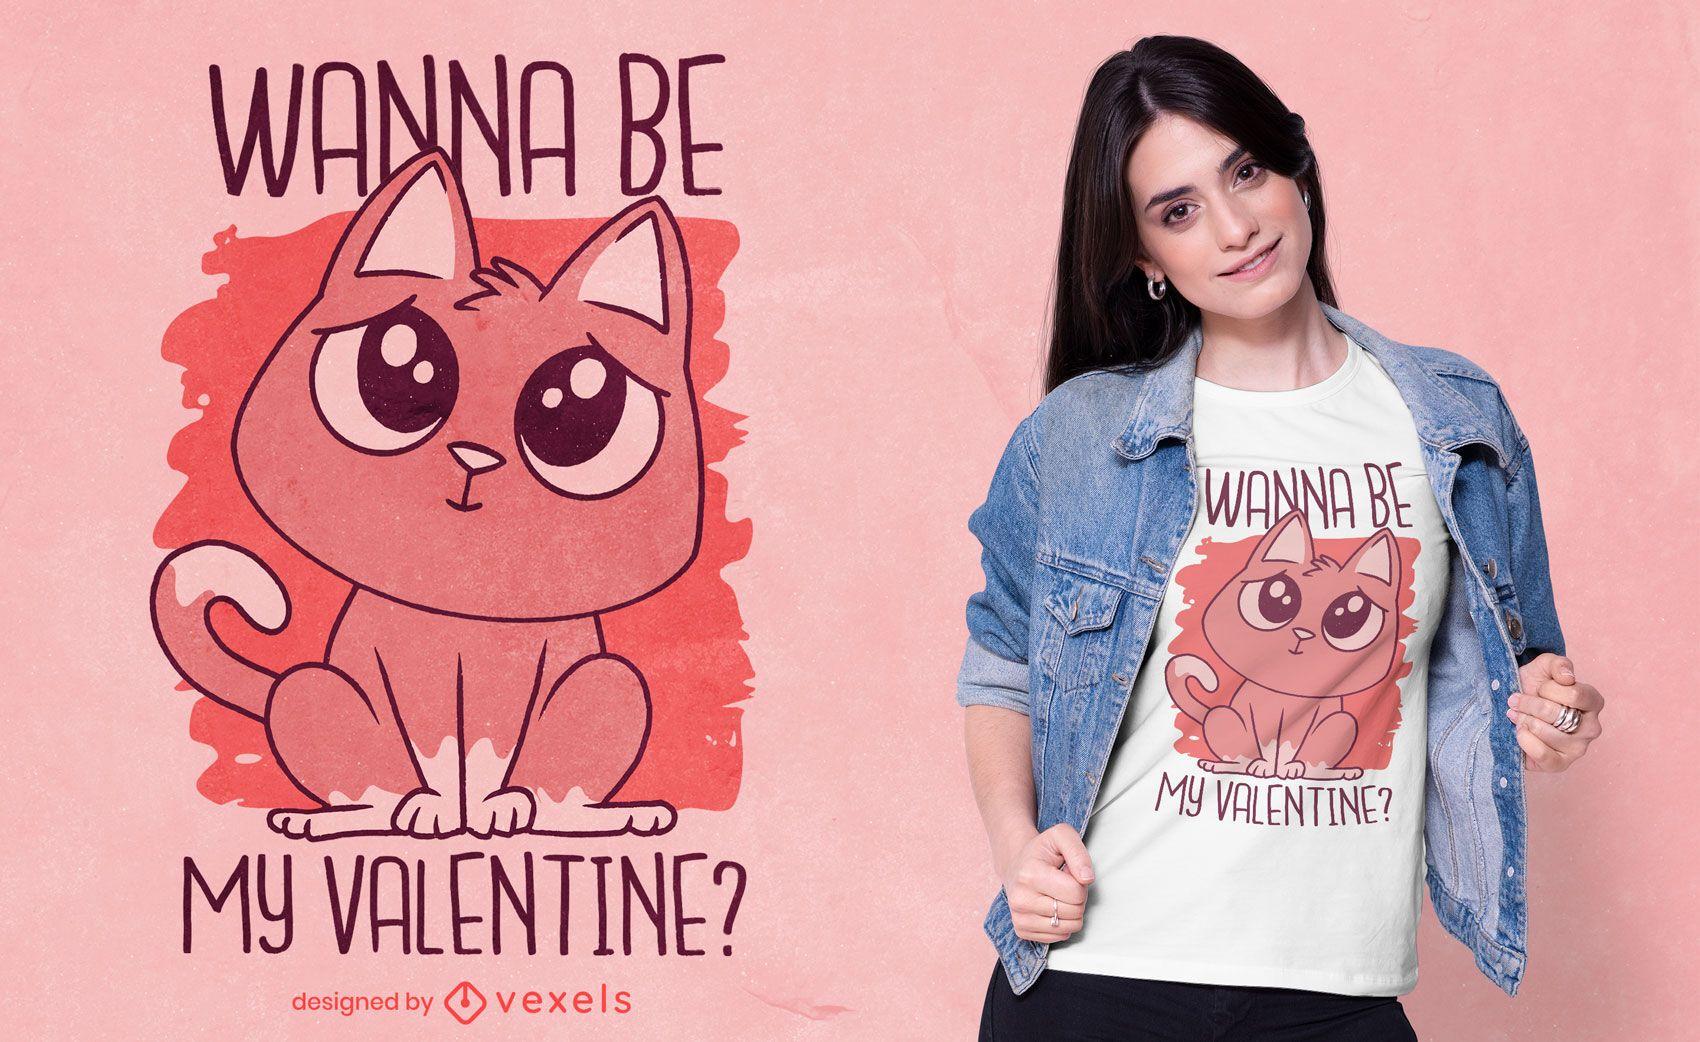 Wanna be my valentine t-shirt design